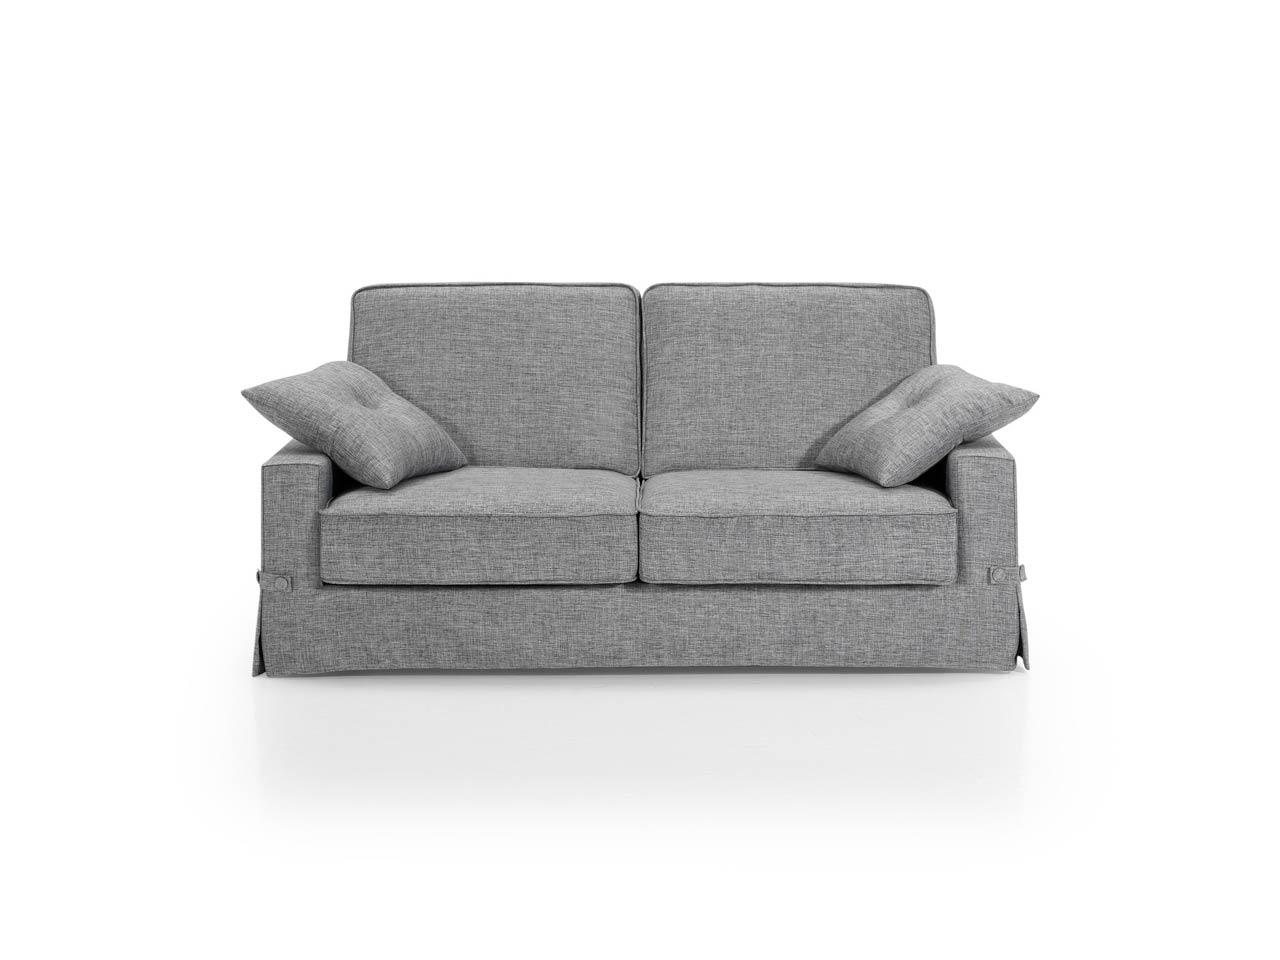 Comprar sofas cama sistema italiano for Sofa cama italiano